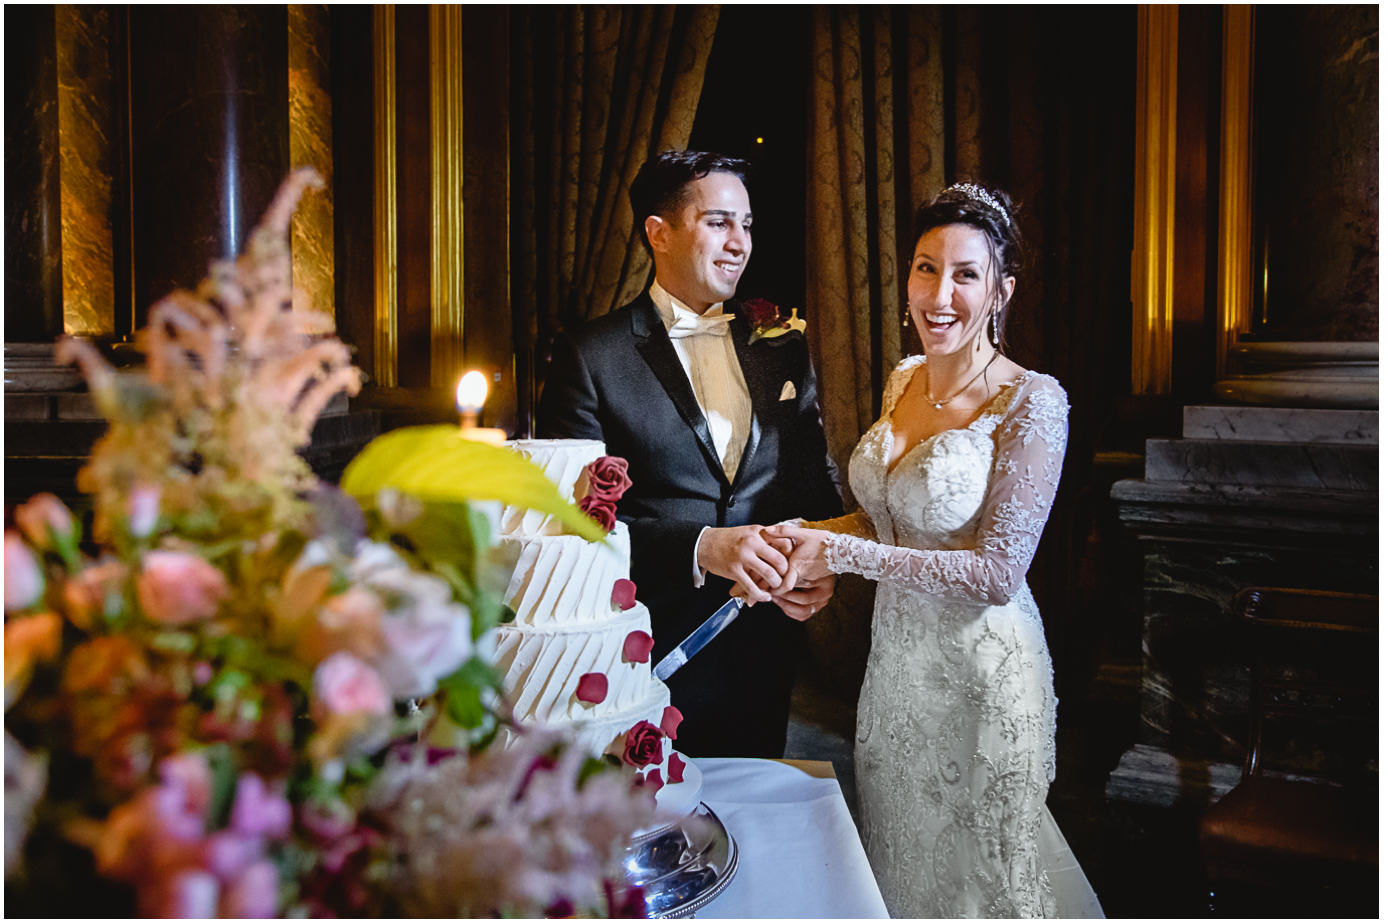 iranian wedding photographer 209 - Drapers Hall London Wedding Photographer